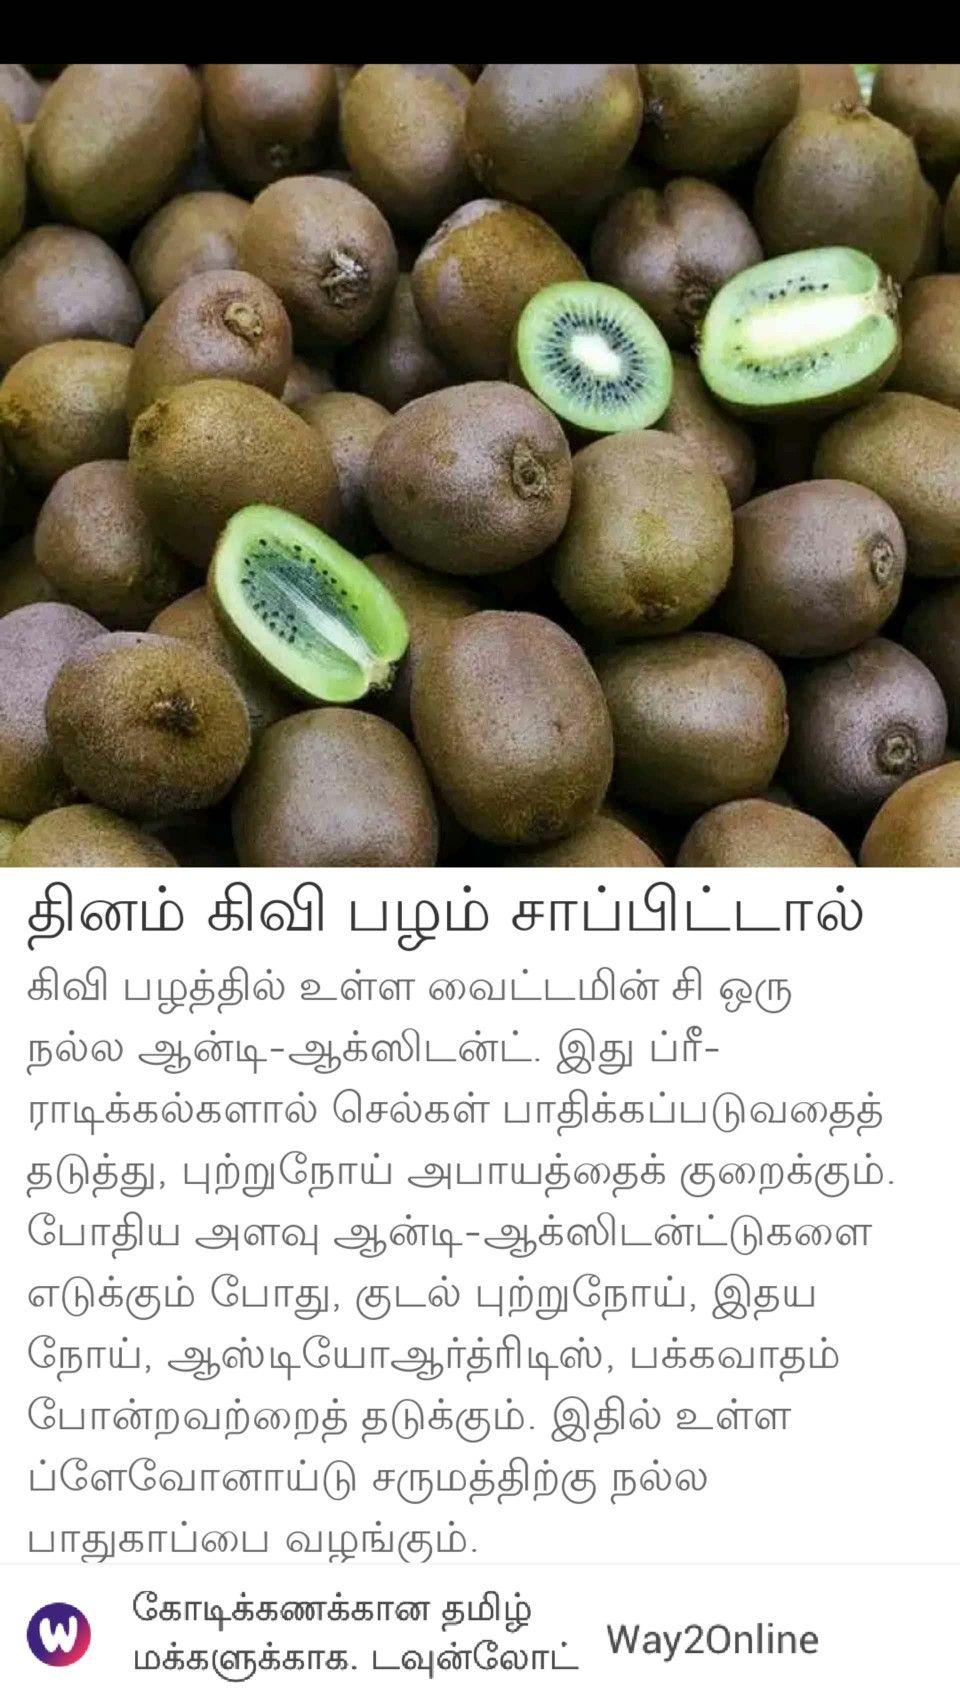 Pin By Vanaja Thavayogarajah On Health Tips Fruit Health